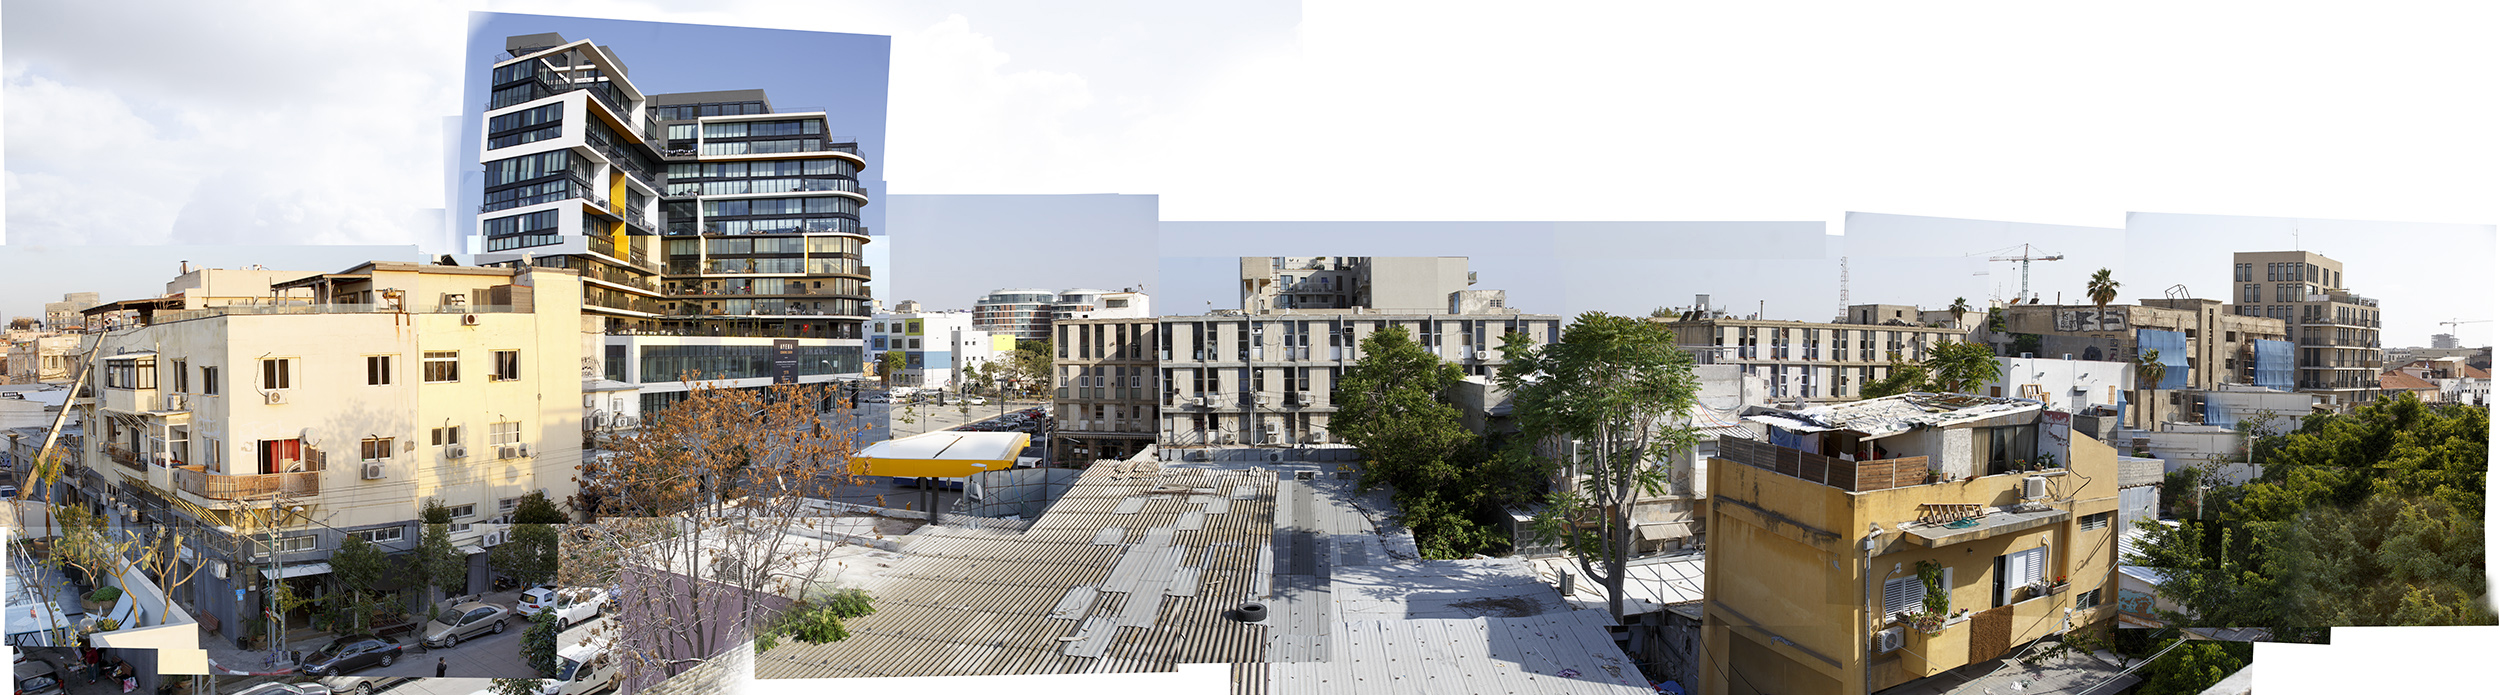 Eilat st., 2017, photo-collage, inkjet print, 110x400 cm